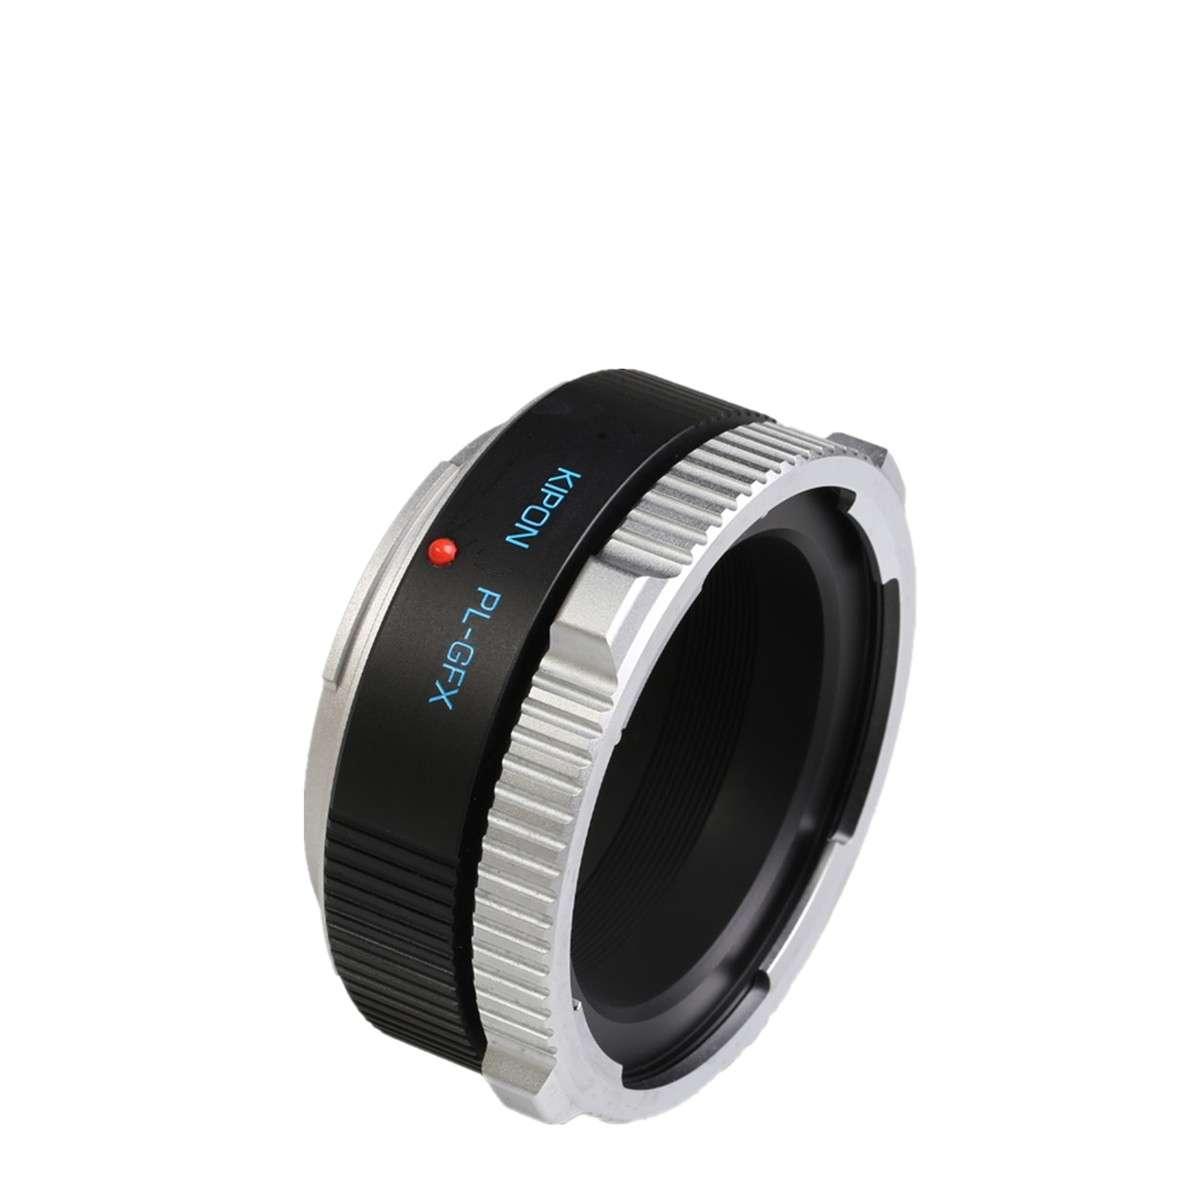 Kipon Adapter Fr Pl Auf Fuji Gfx Foto Walser Mamiya 645 Mount Lens To Medium Format Camera